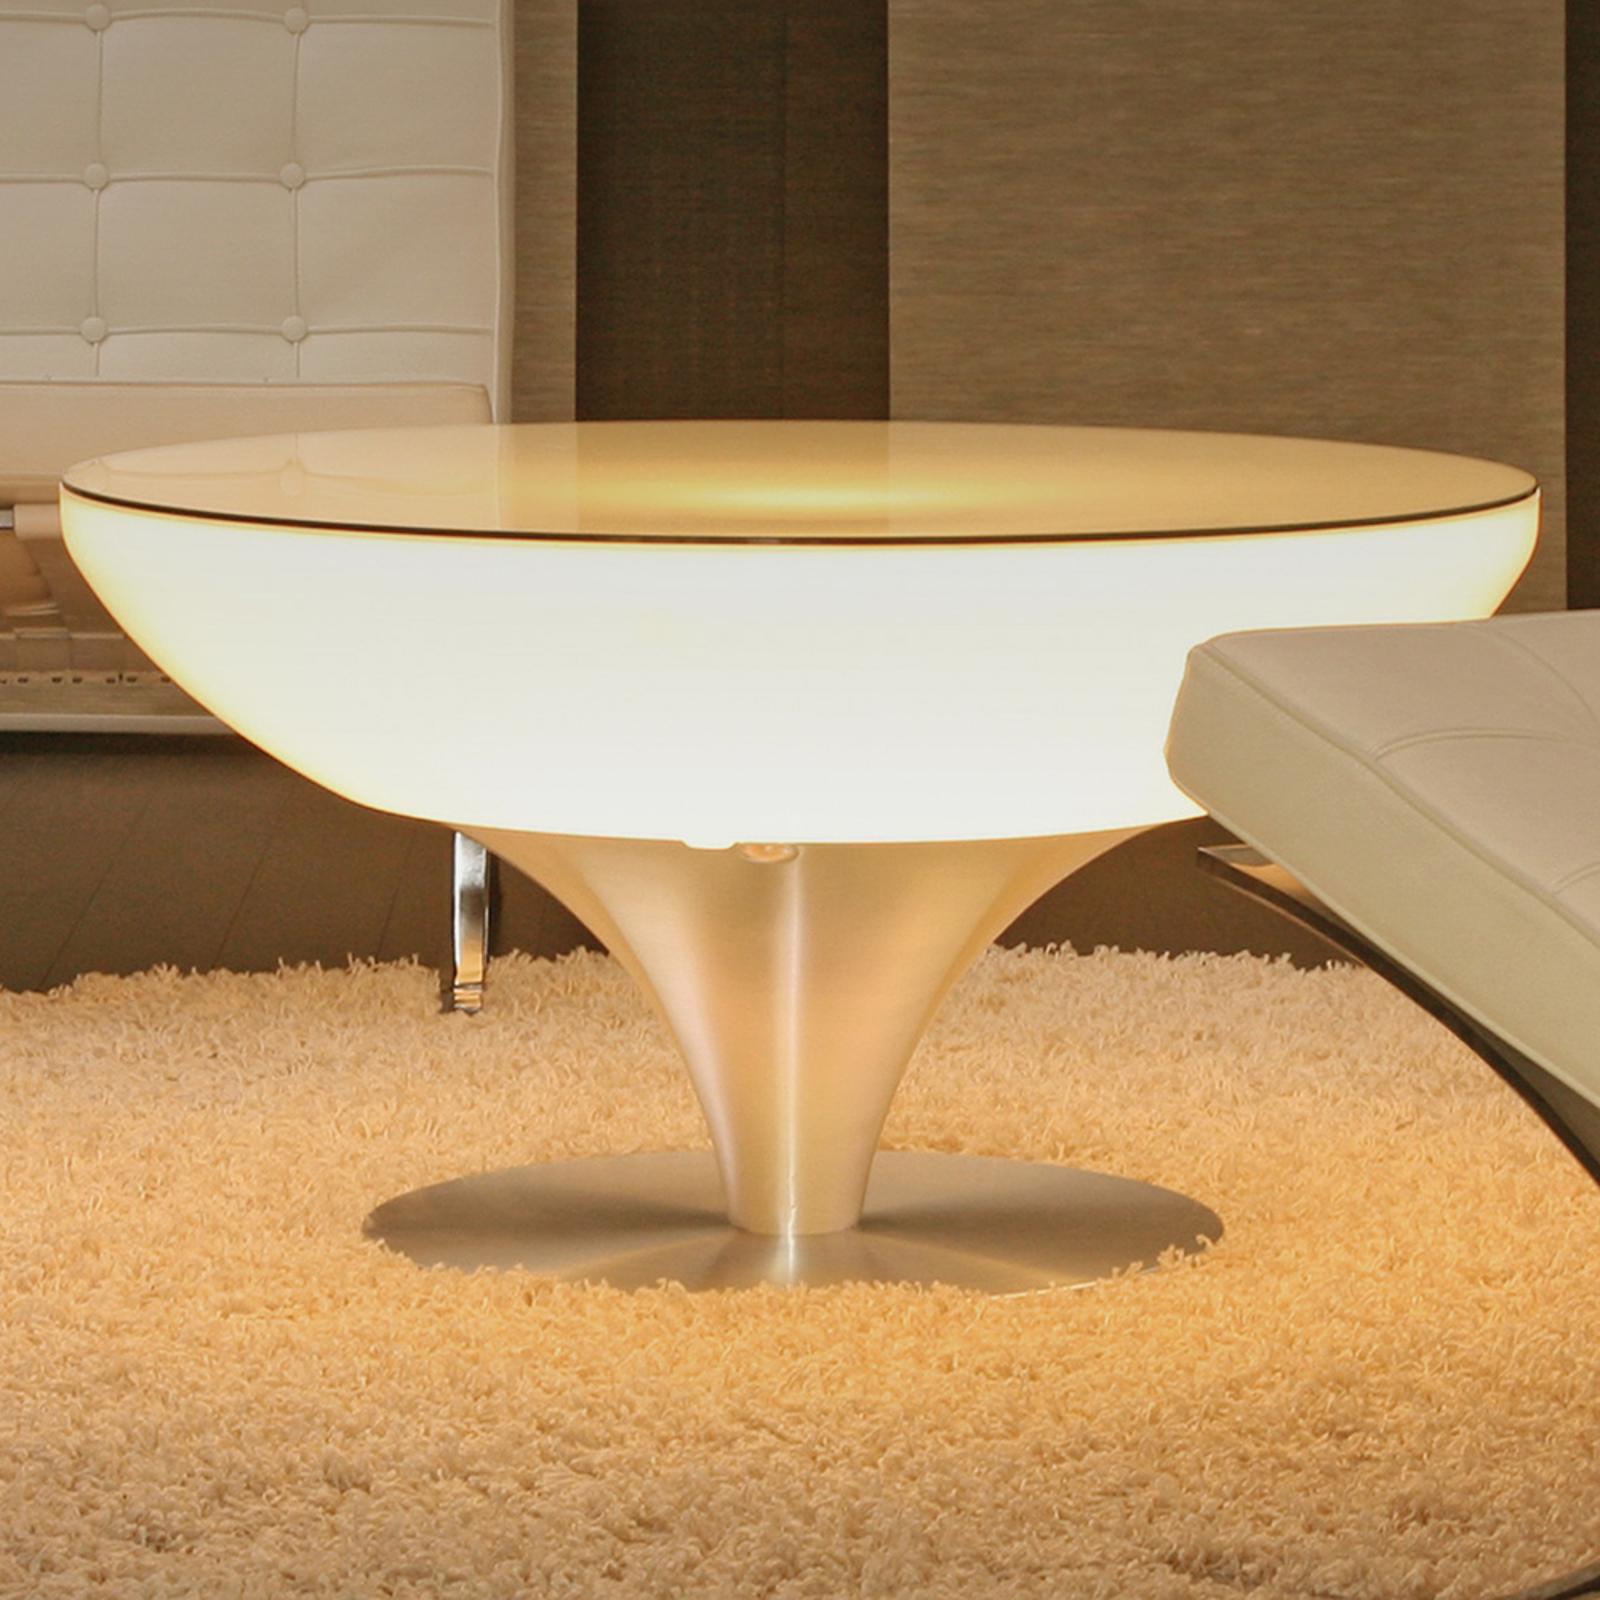 Leuchttisch Lounge Table LED Pro Accu H 45 cm